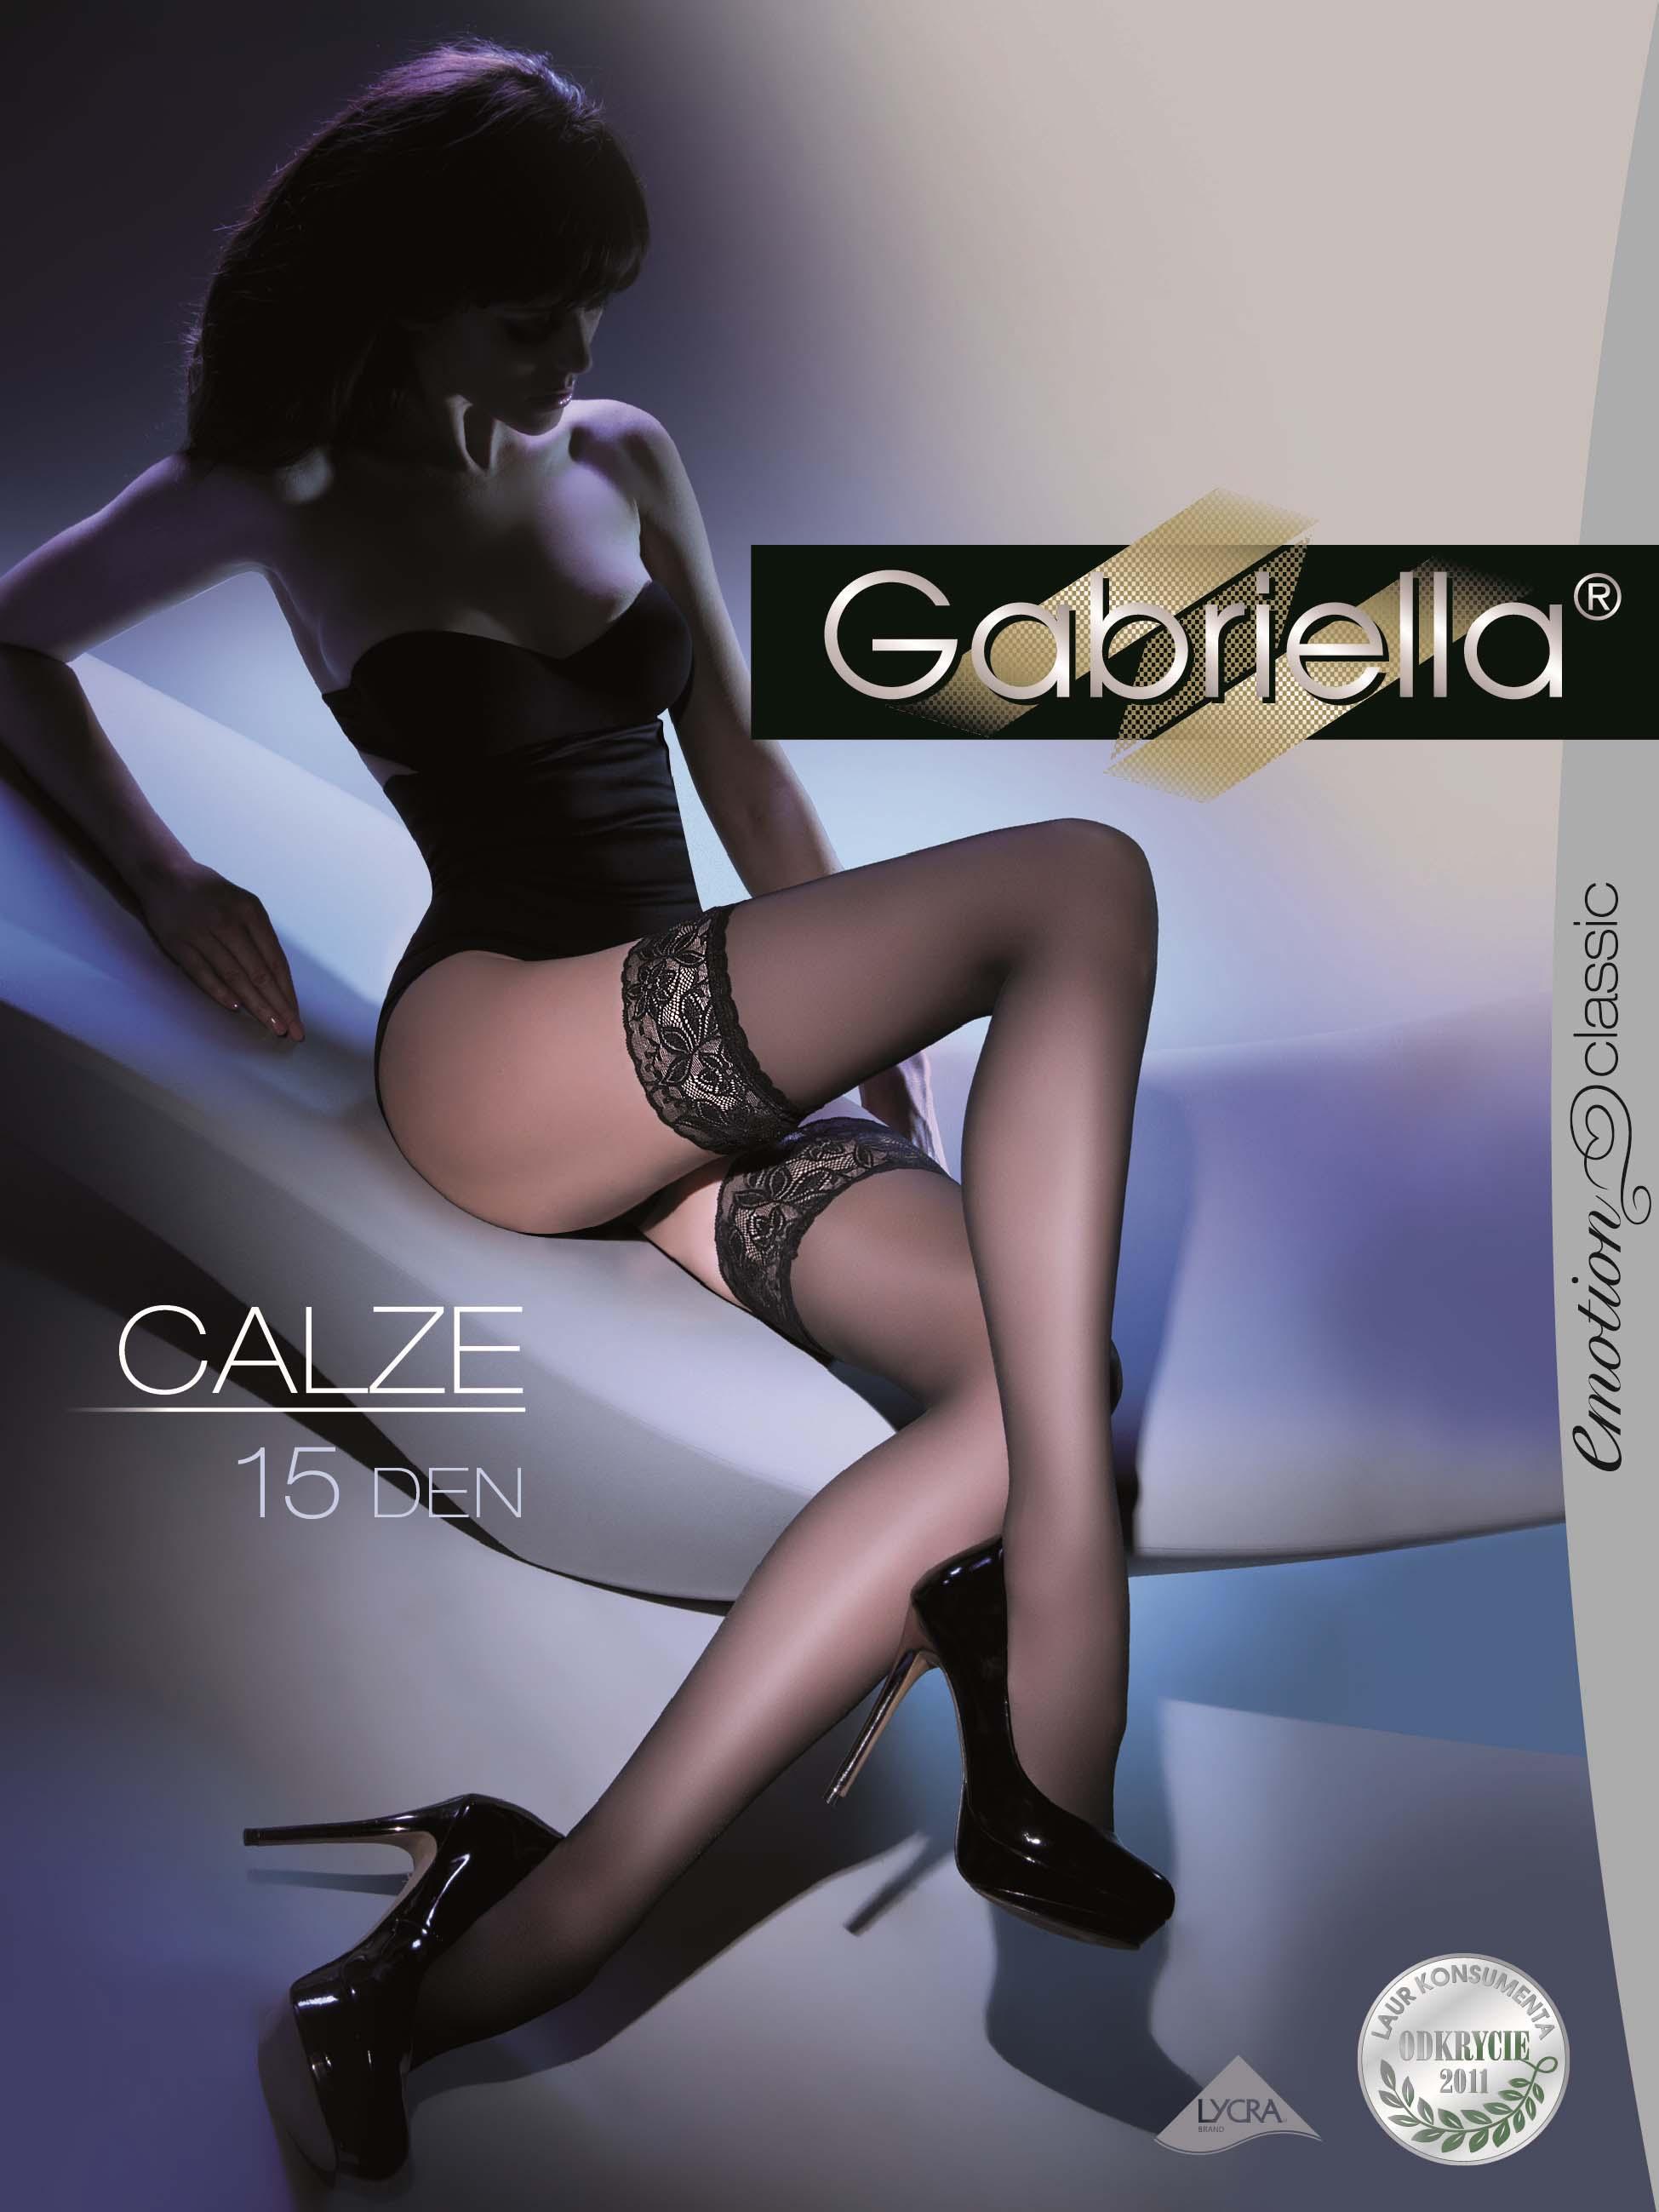 pończochy Calze gabriella